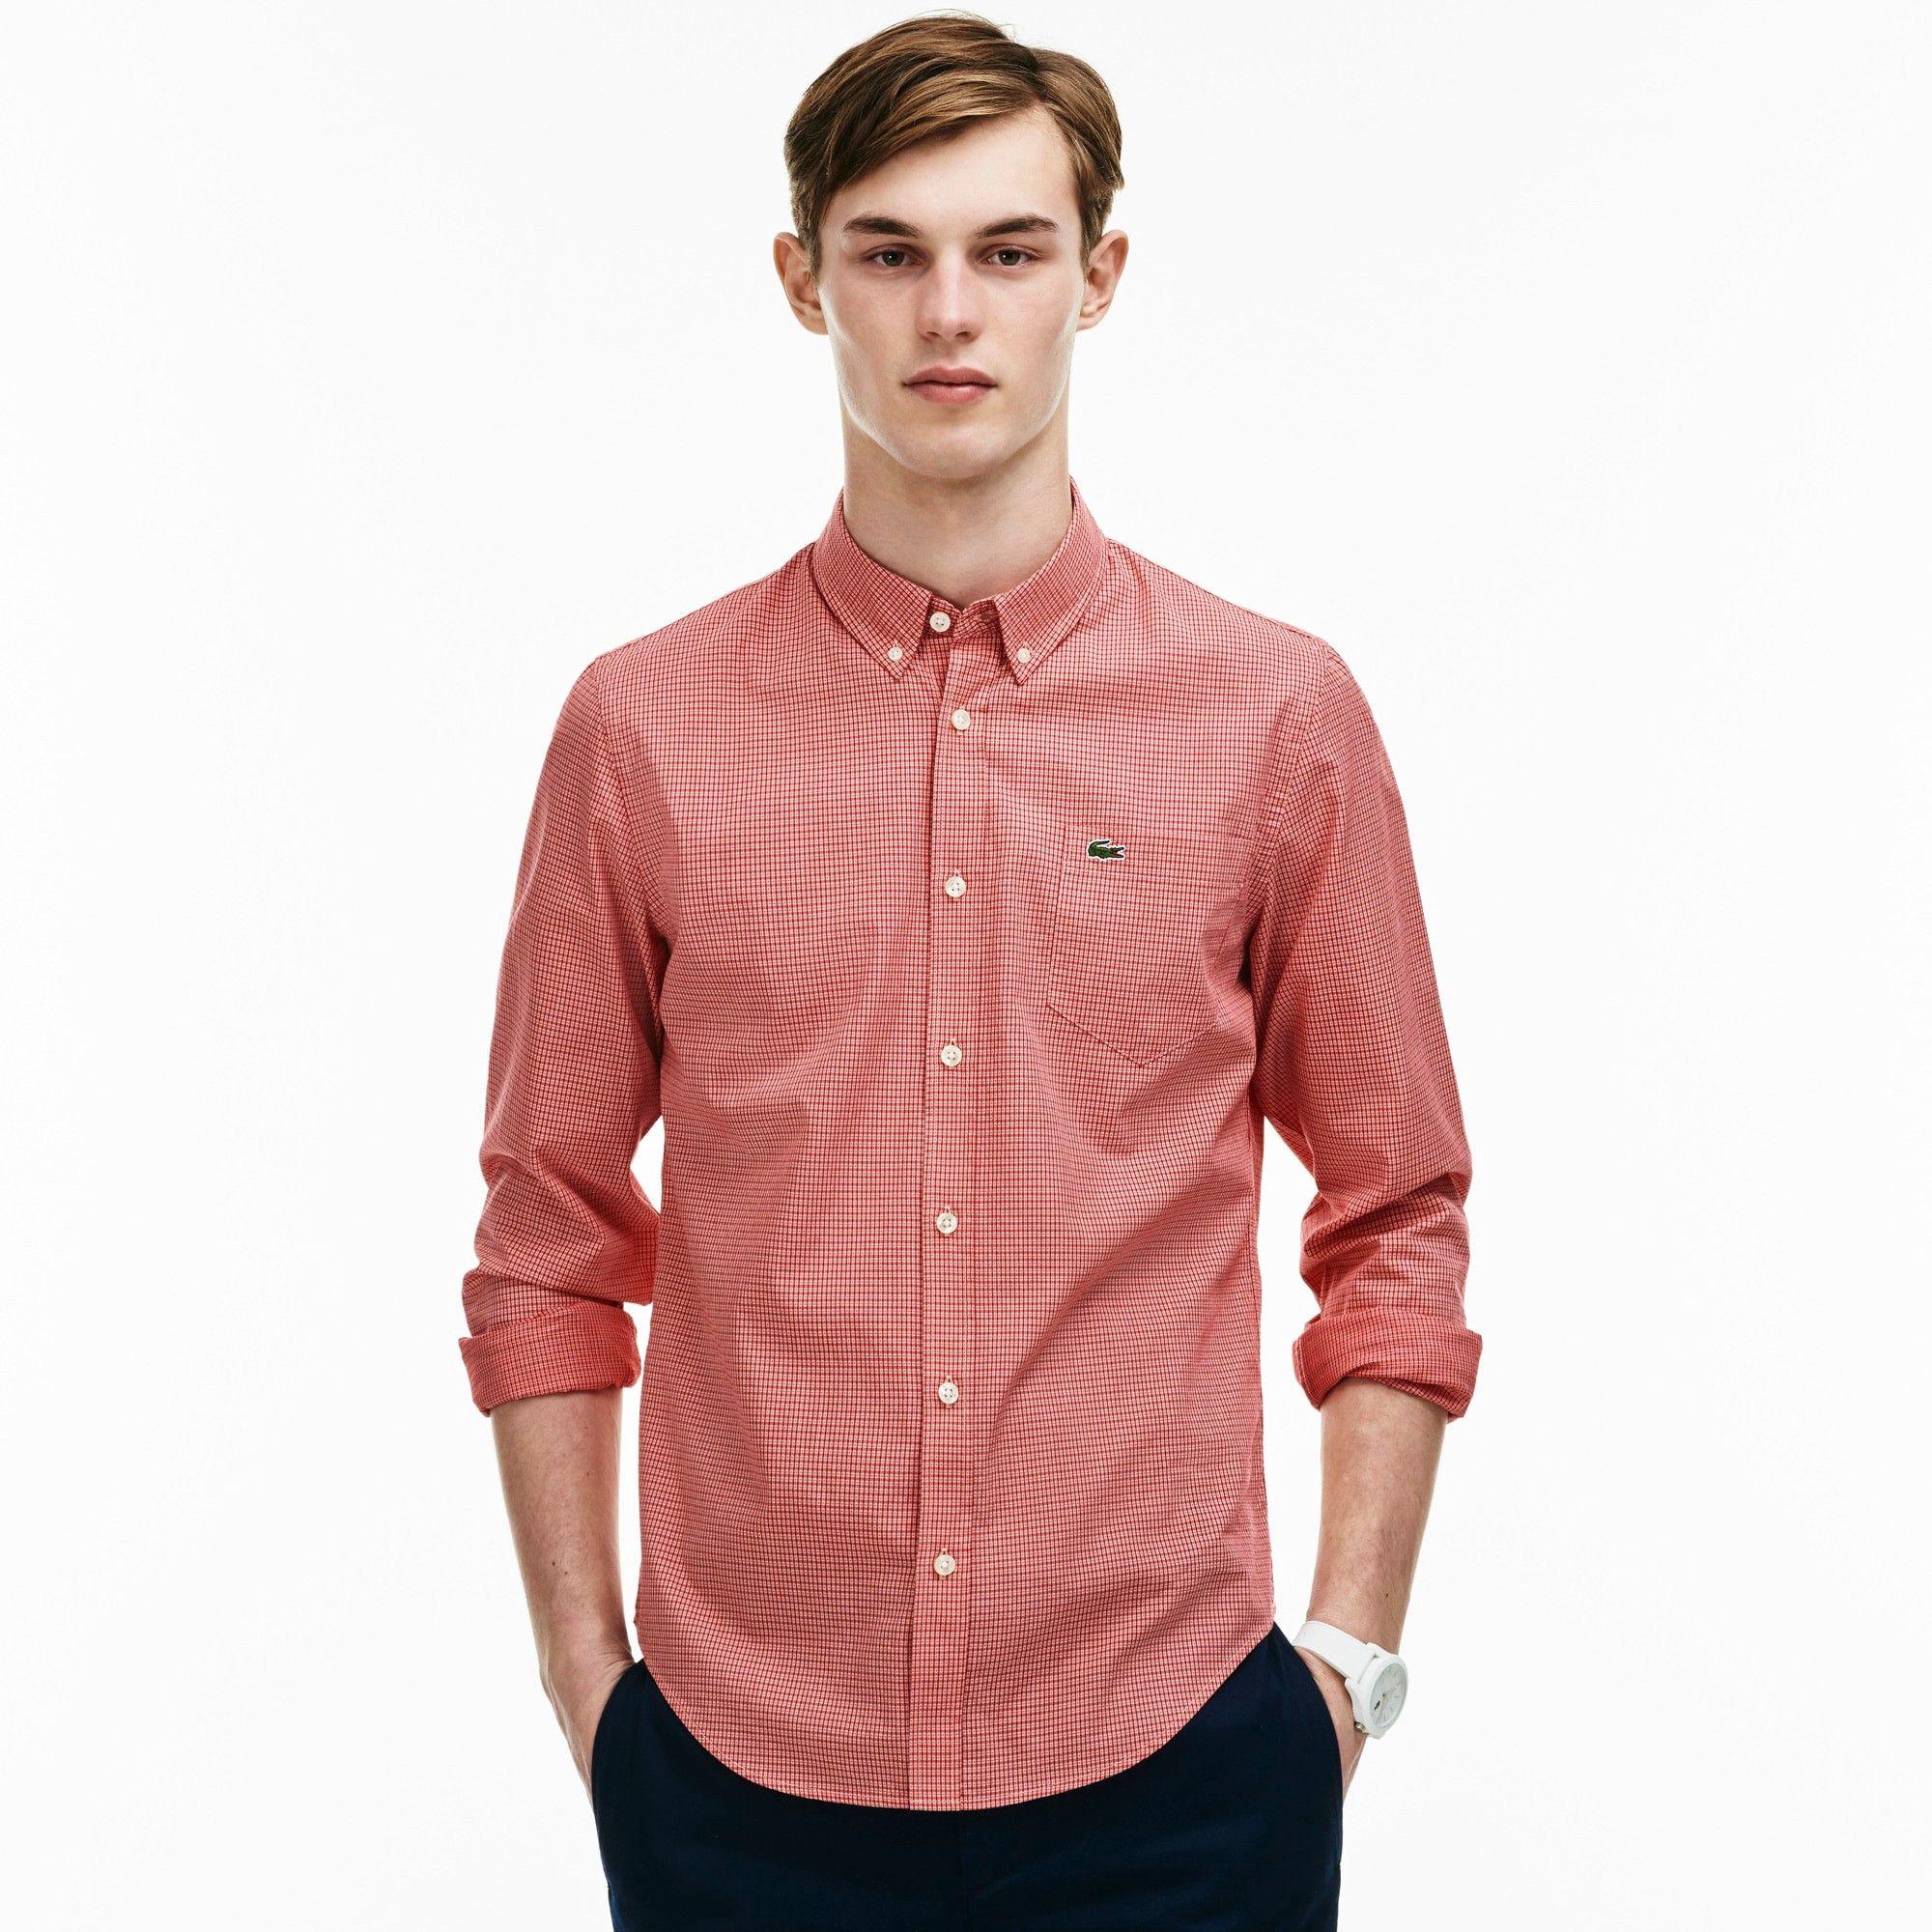 e08ee119da LACOSTE Men's Slim Fit Checked Jacquard Cotton Poplin Shirt - red ...